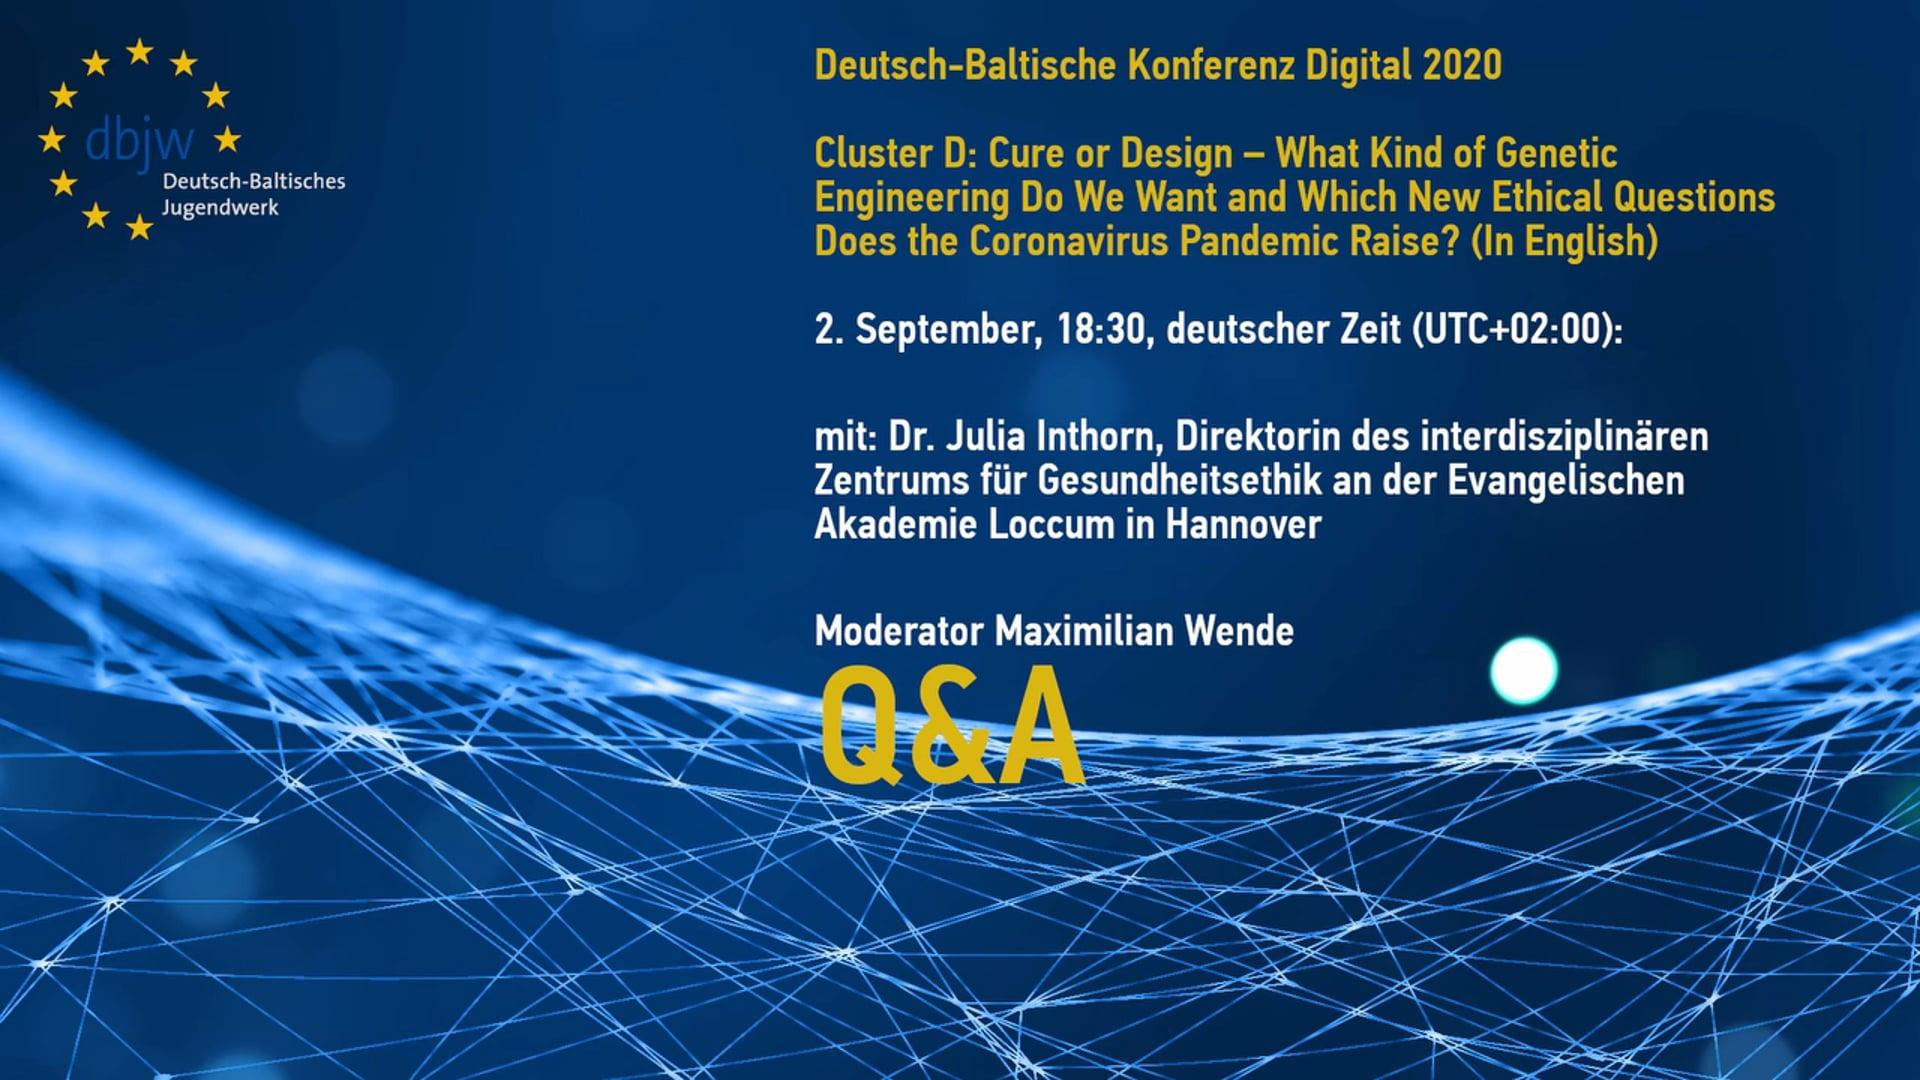 DBKDigital20 Keynote Cluster D – Question and Answer